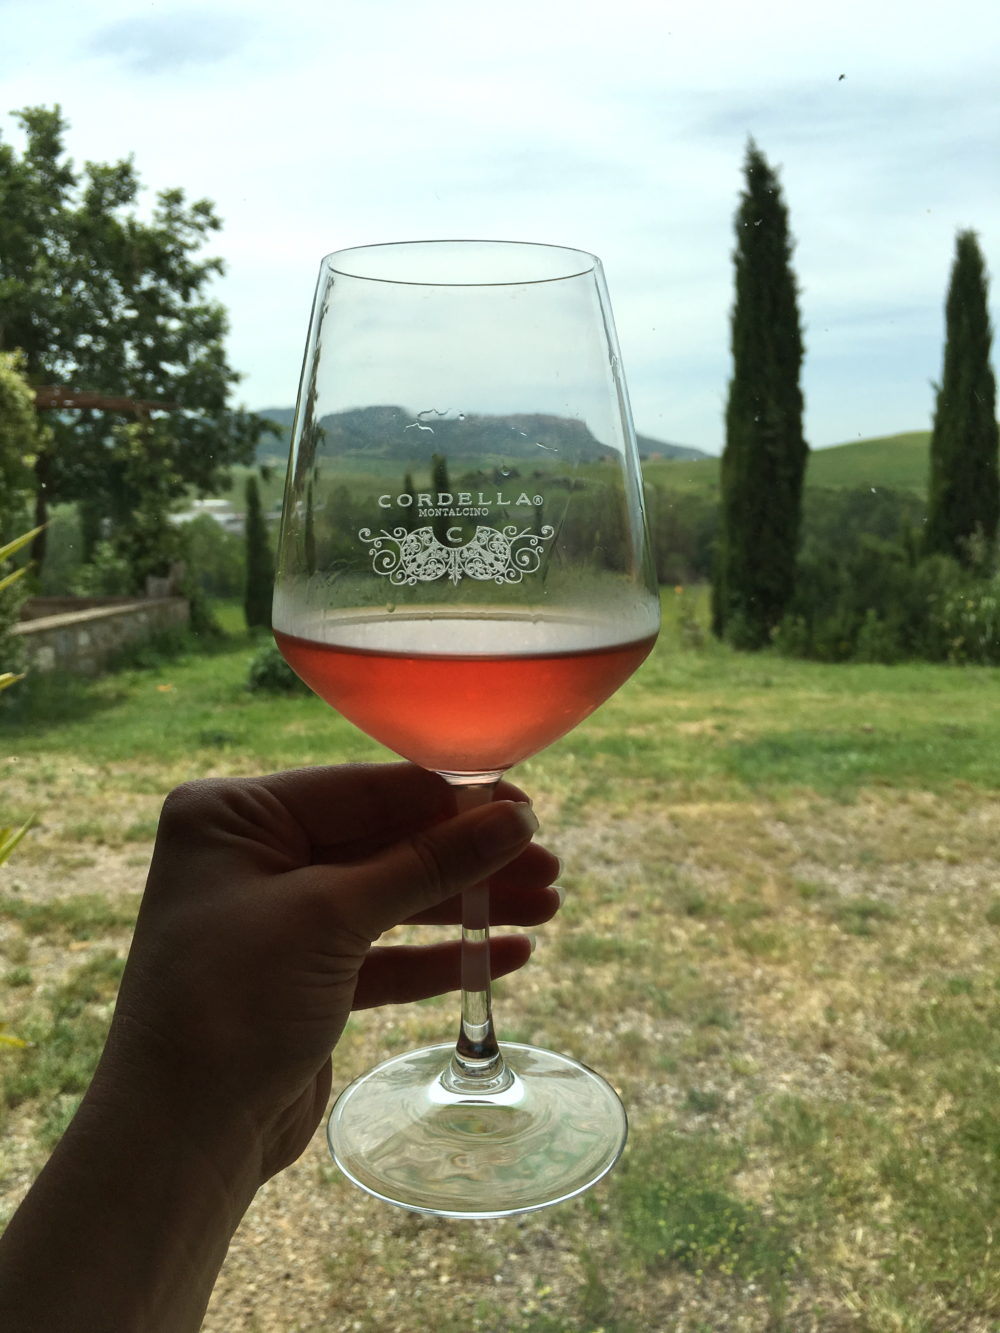 Petite Suitcase- Cordella winery